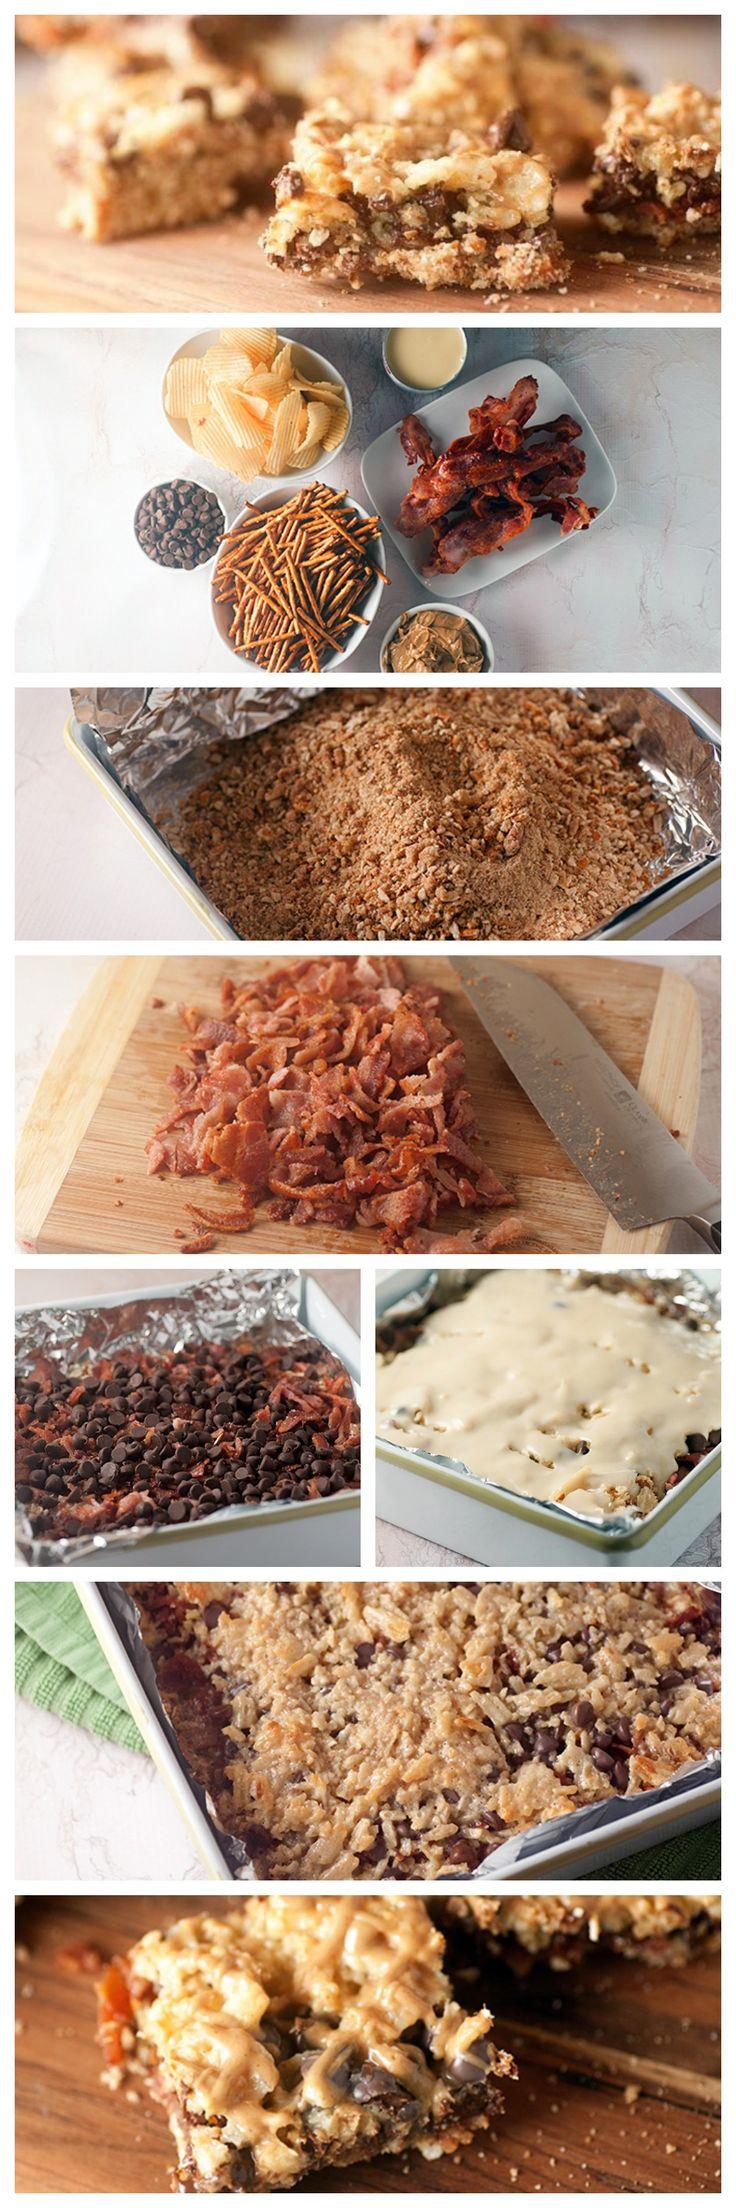 Bacon Chocolate Couch Potato Bars #bacon #chocolate